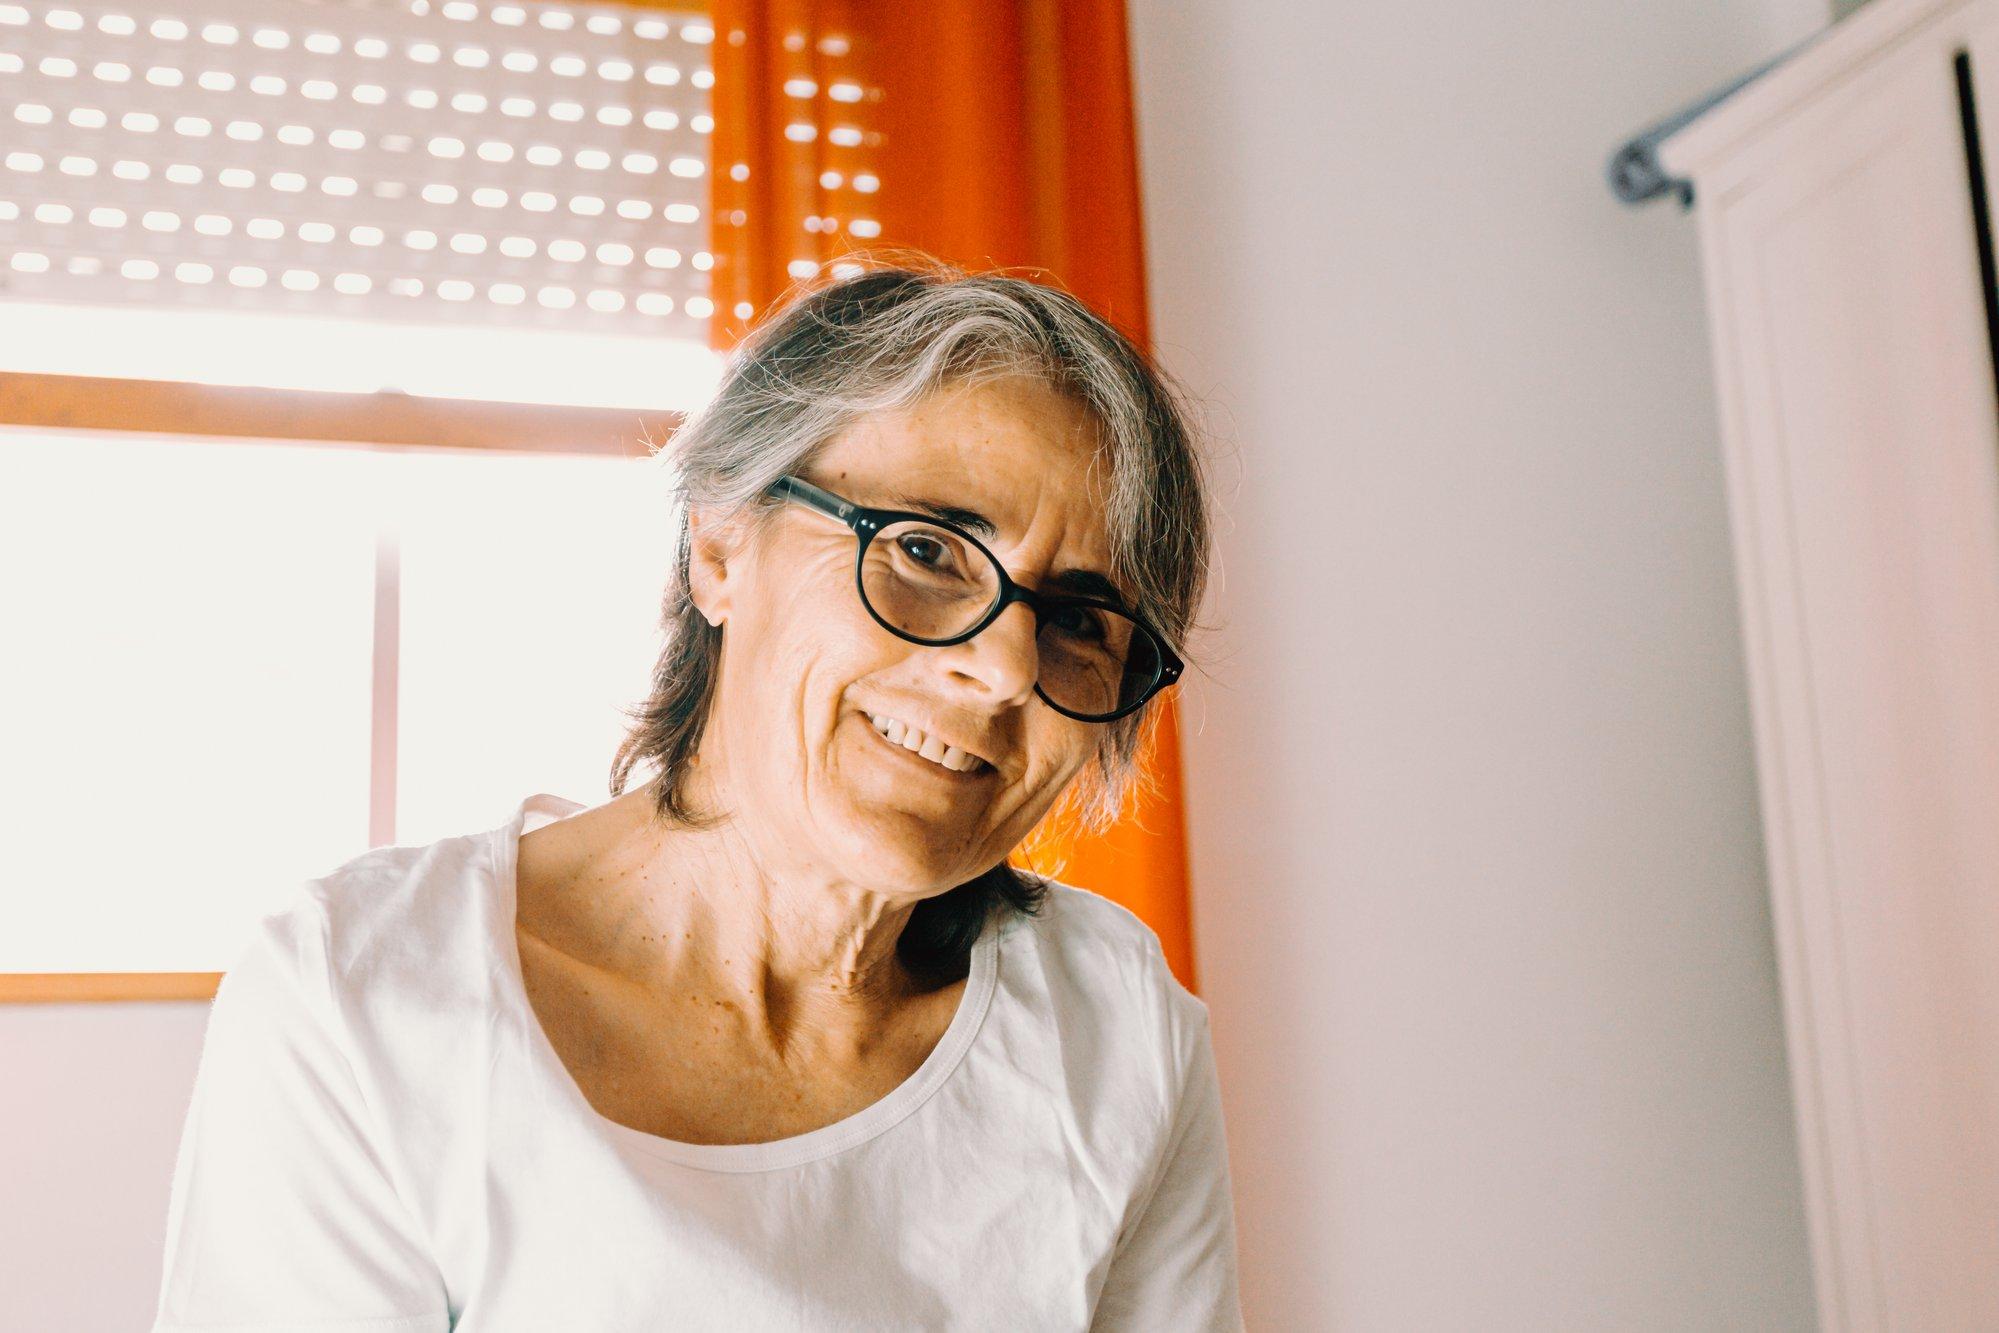 woman smiling to the camera with orange curtains behind 女人对着镜头微笑,身后是橙色的窗帘。